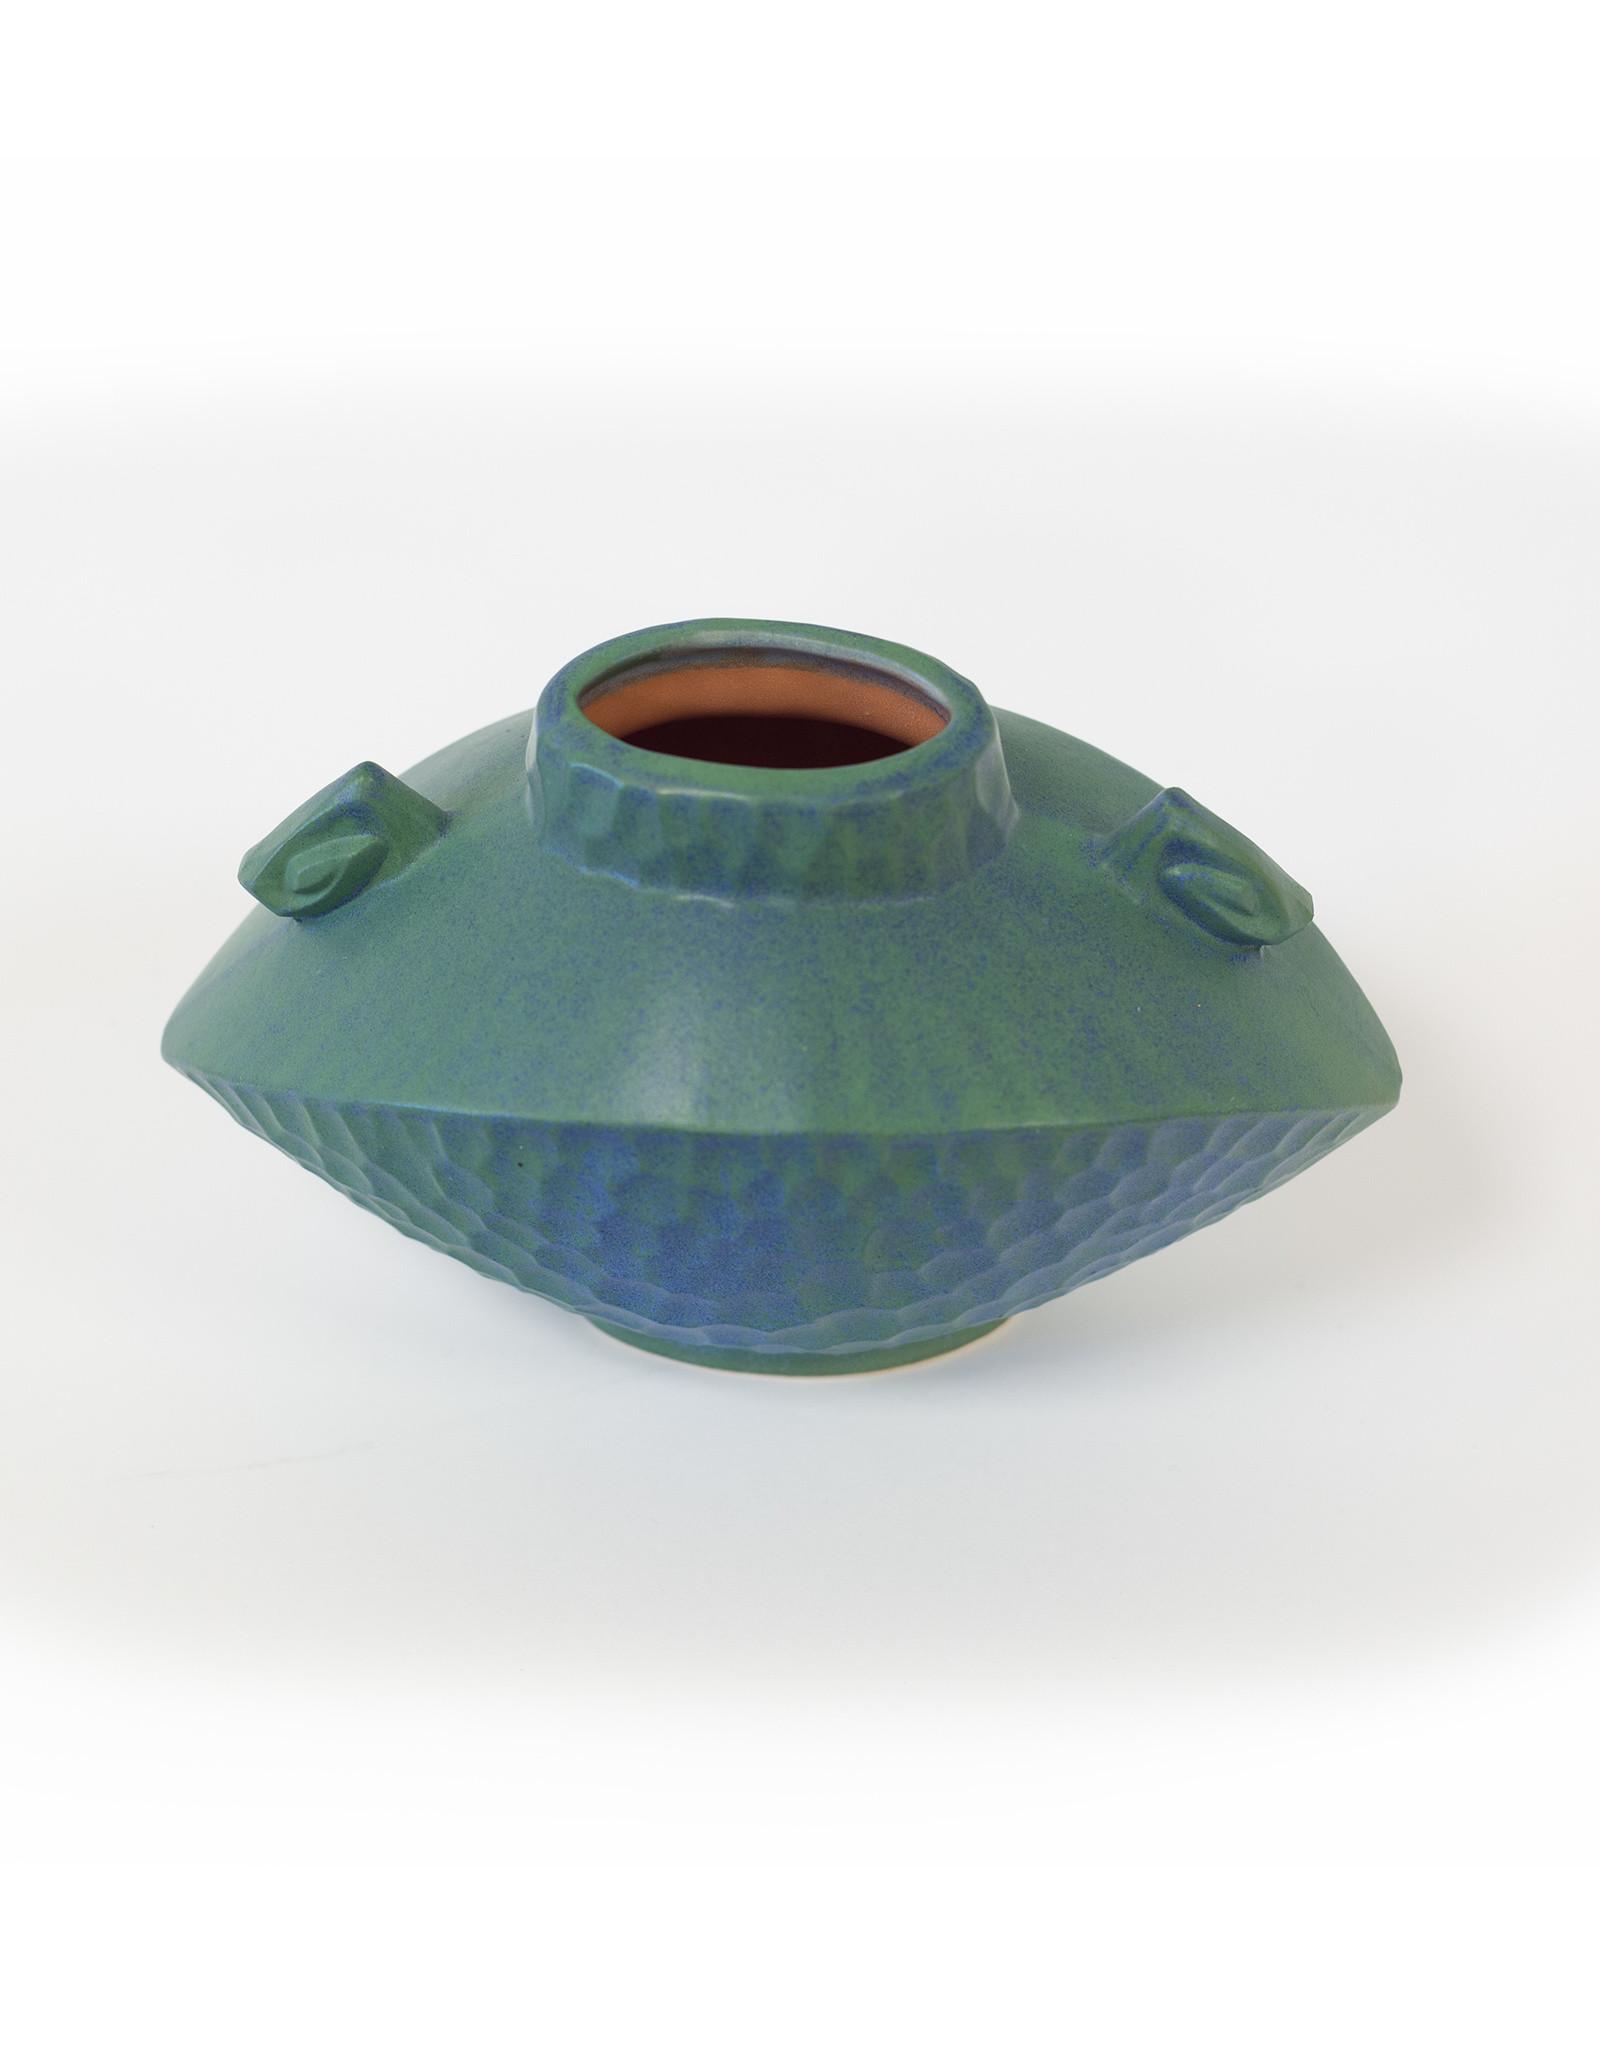 Lonesomeville Pottery Vase Greek Sm Blue-Green